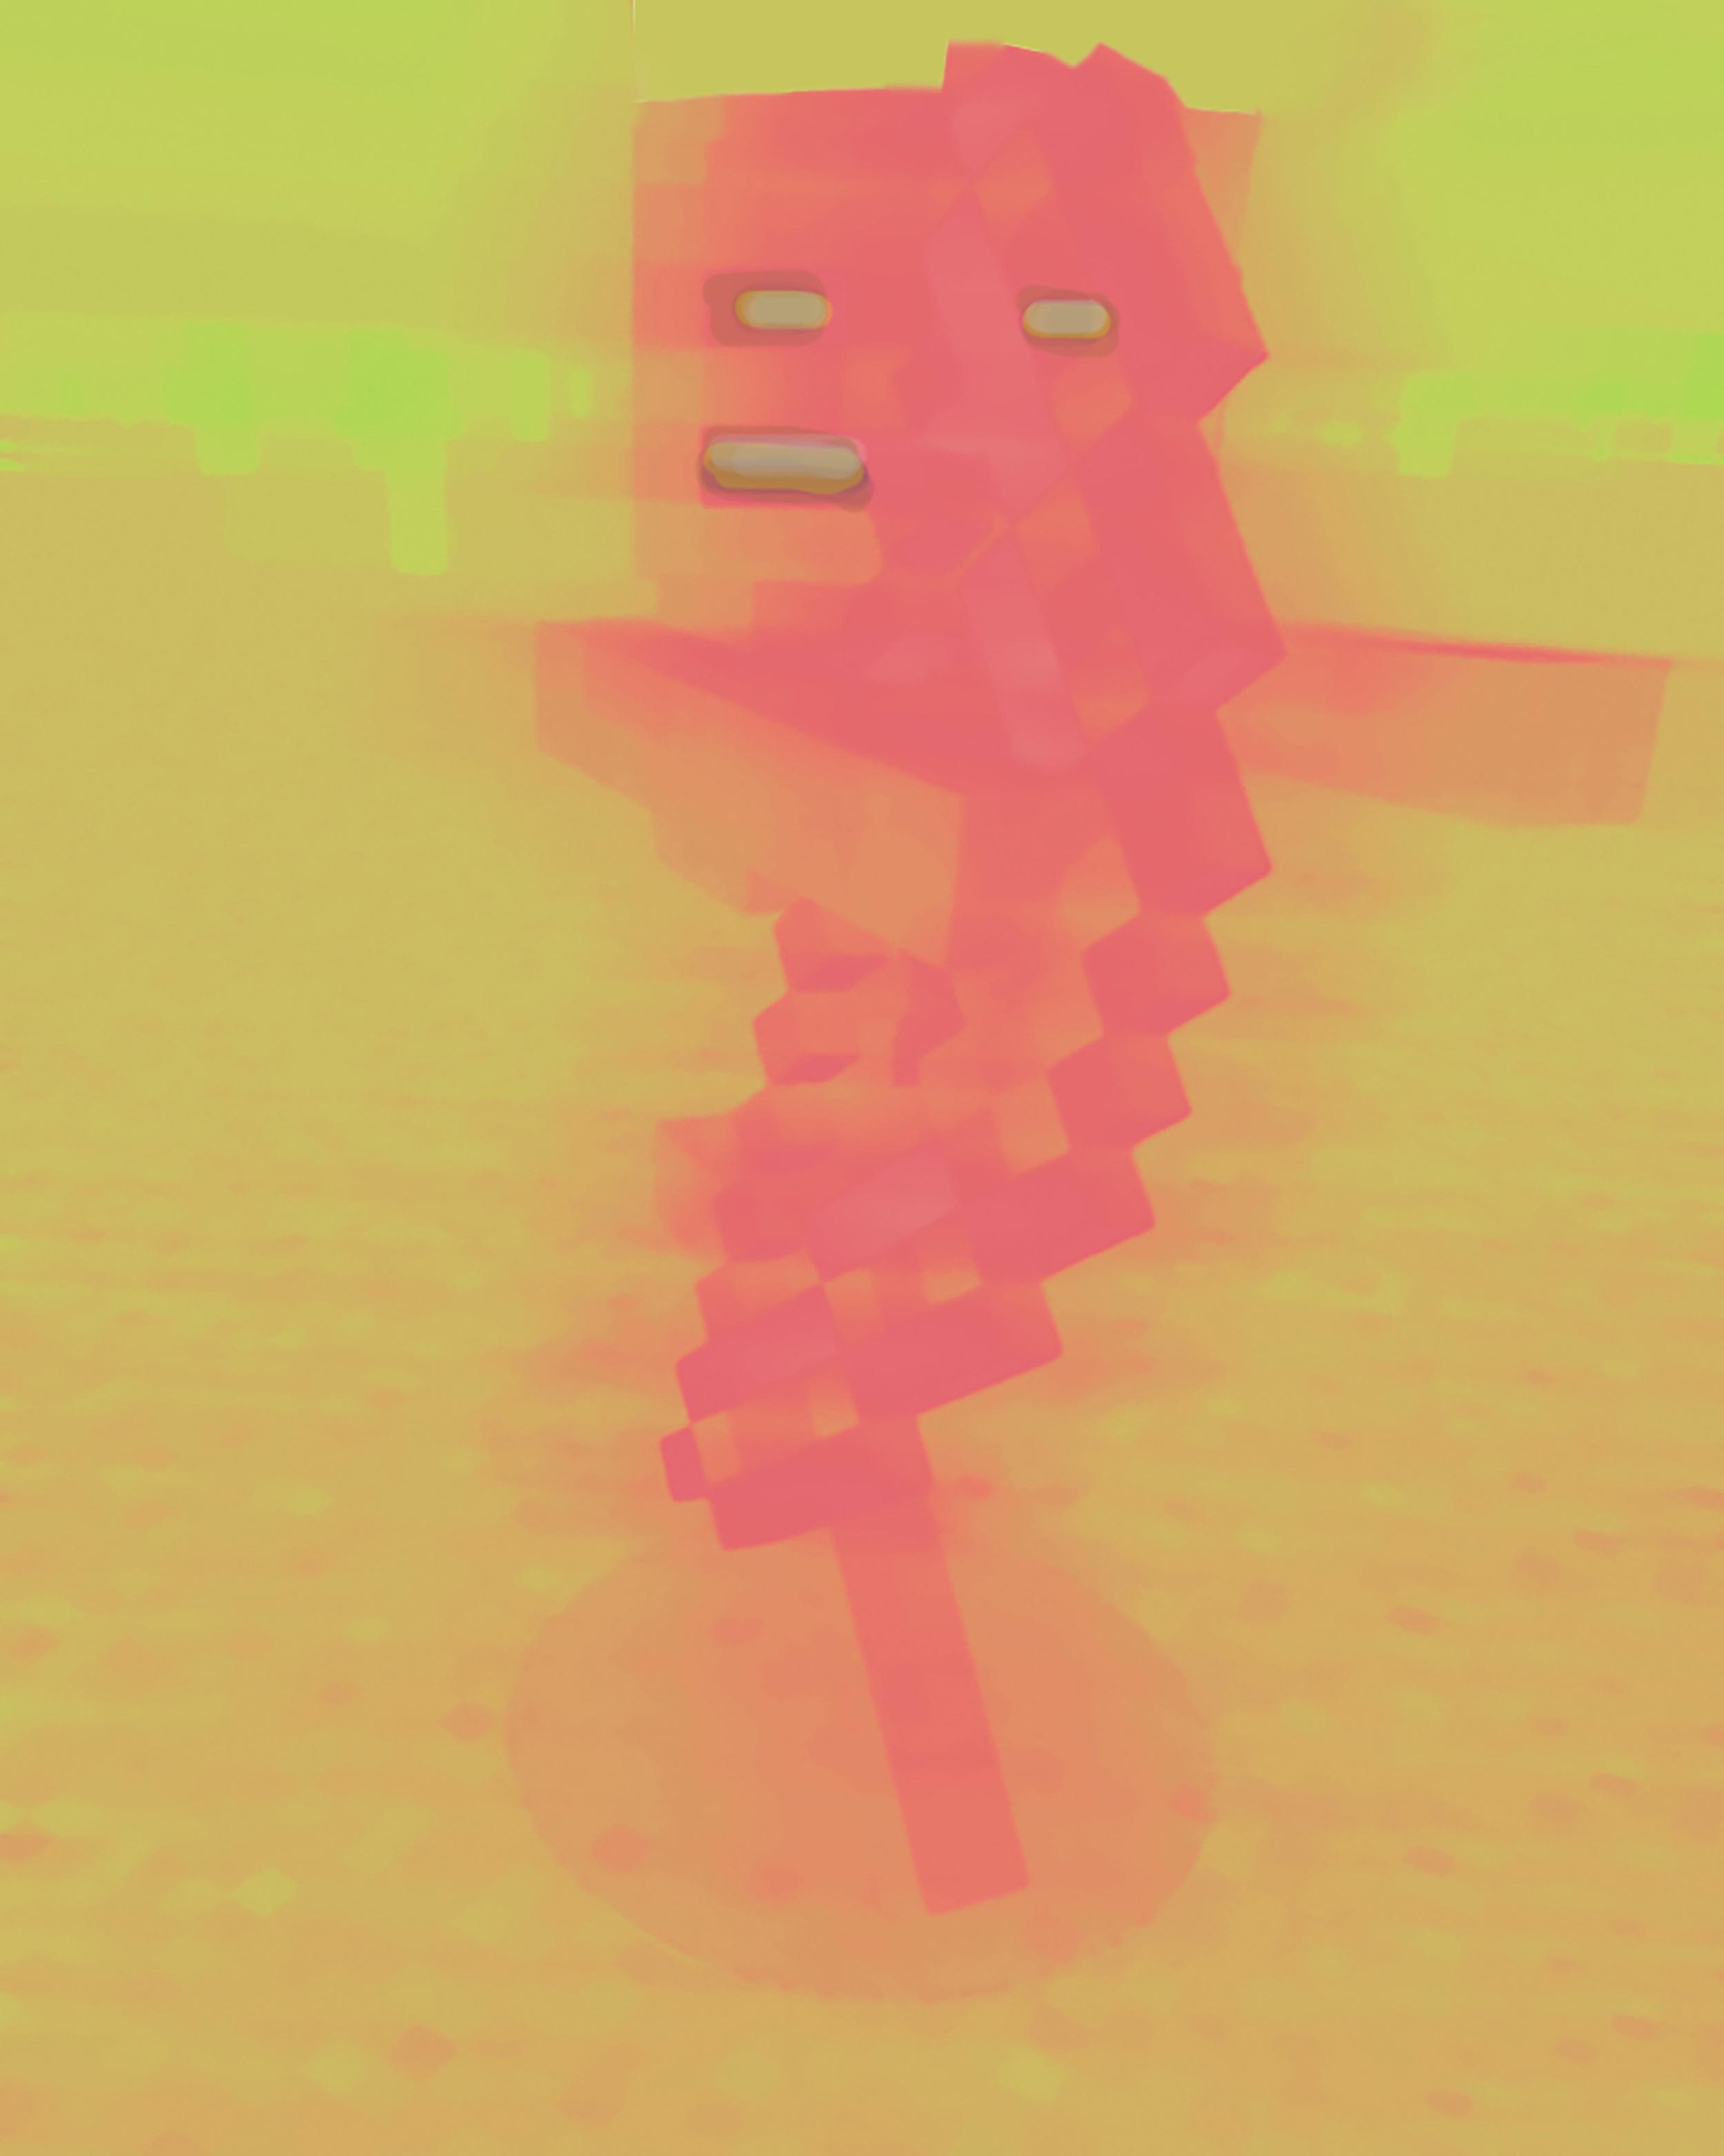 "Glimmer Skeleton 11"" x 14"" Inkjet on Fujifilm deep matte paper, mounted 2015  Edition of 3"